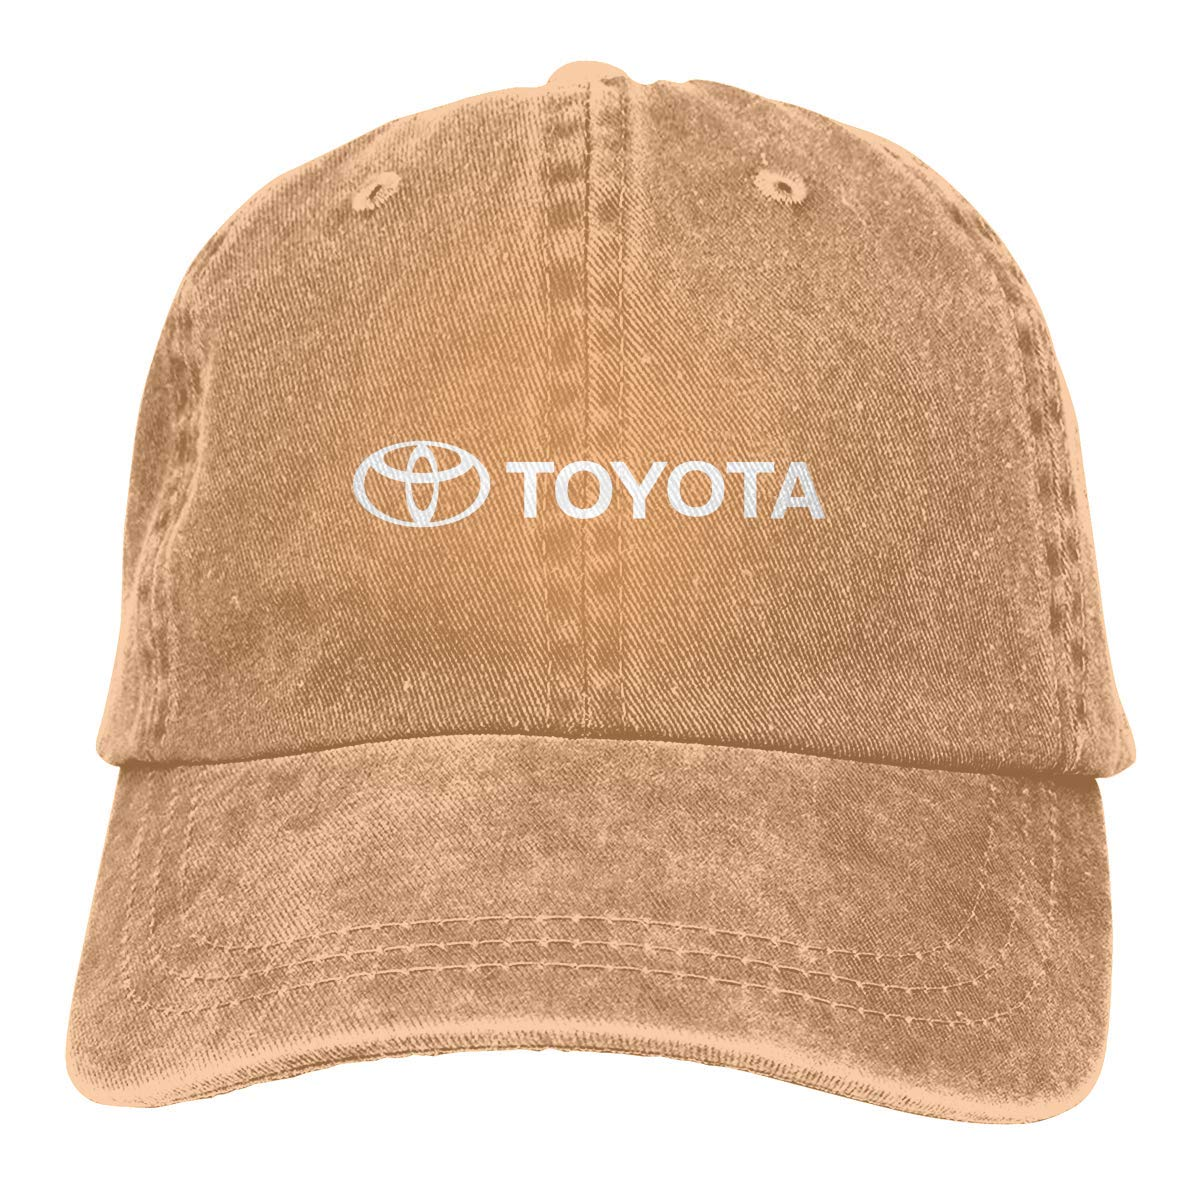 888Cap A Creed Baseball Caps Trucker Hat Mesh Cap for Men Women Boy Girl